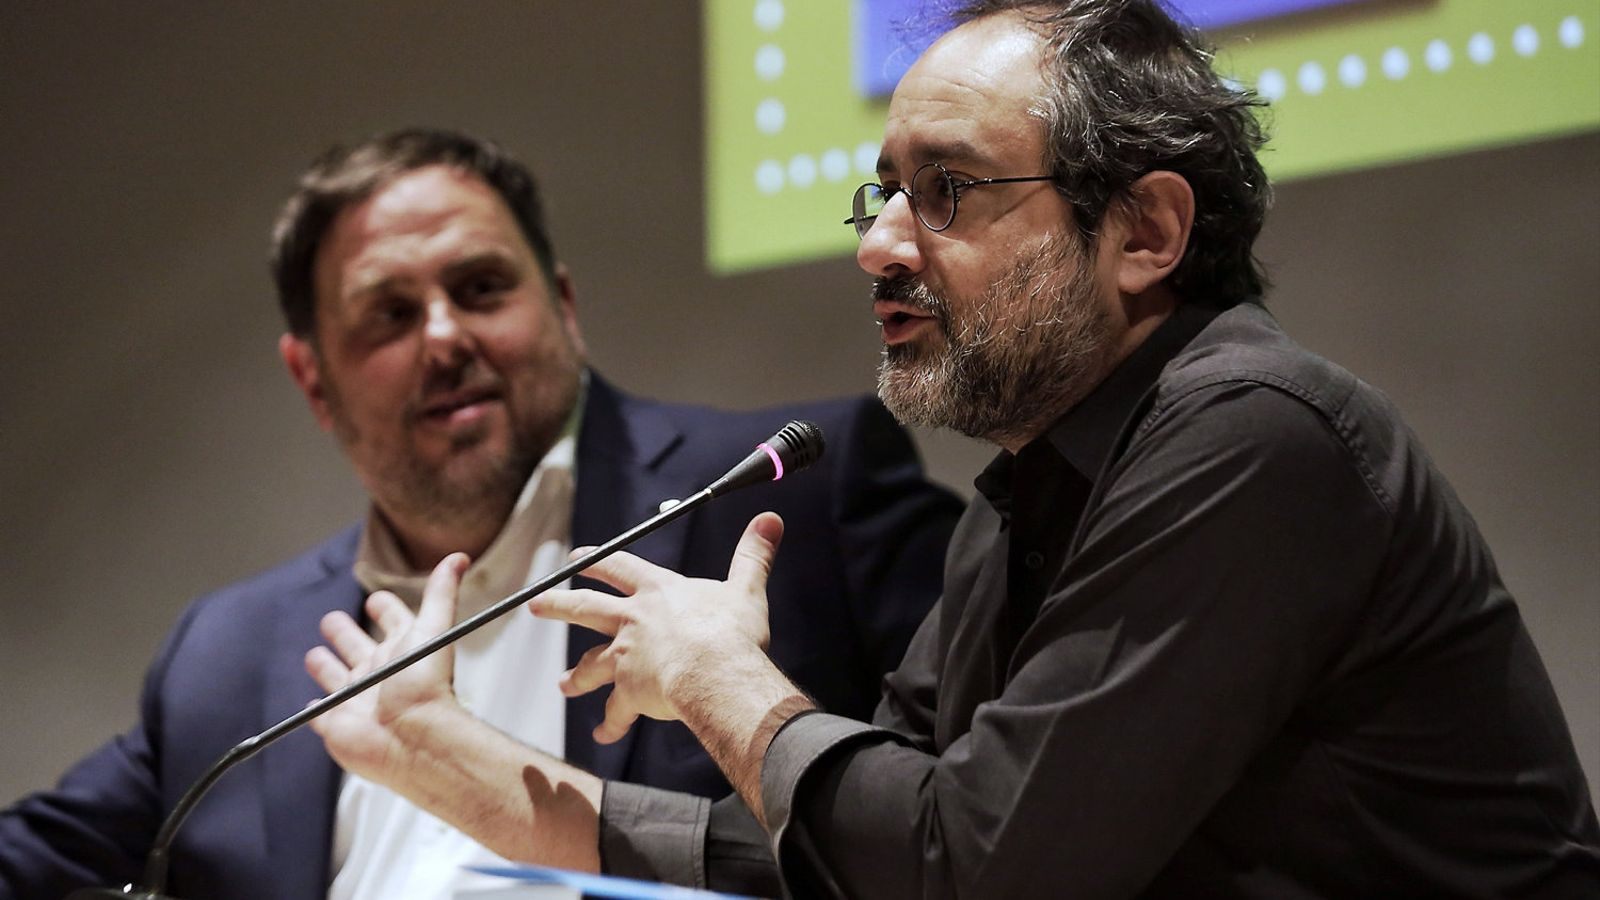 Junqueras va presentar el llibre de Baños al Museu Marítim. / P. VIRGILI